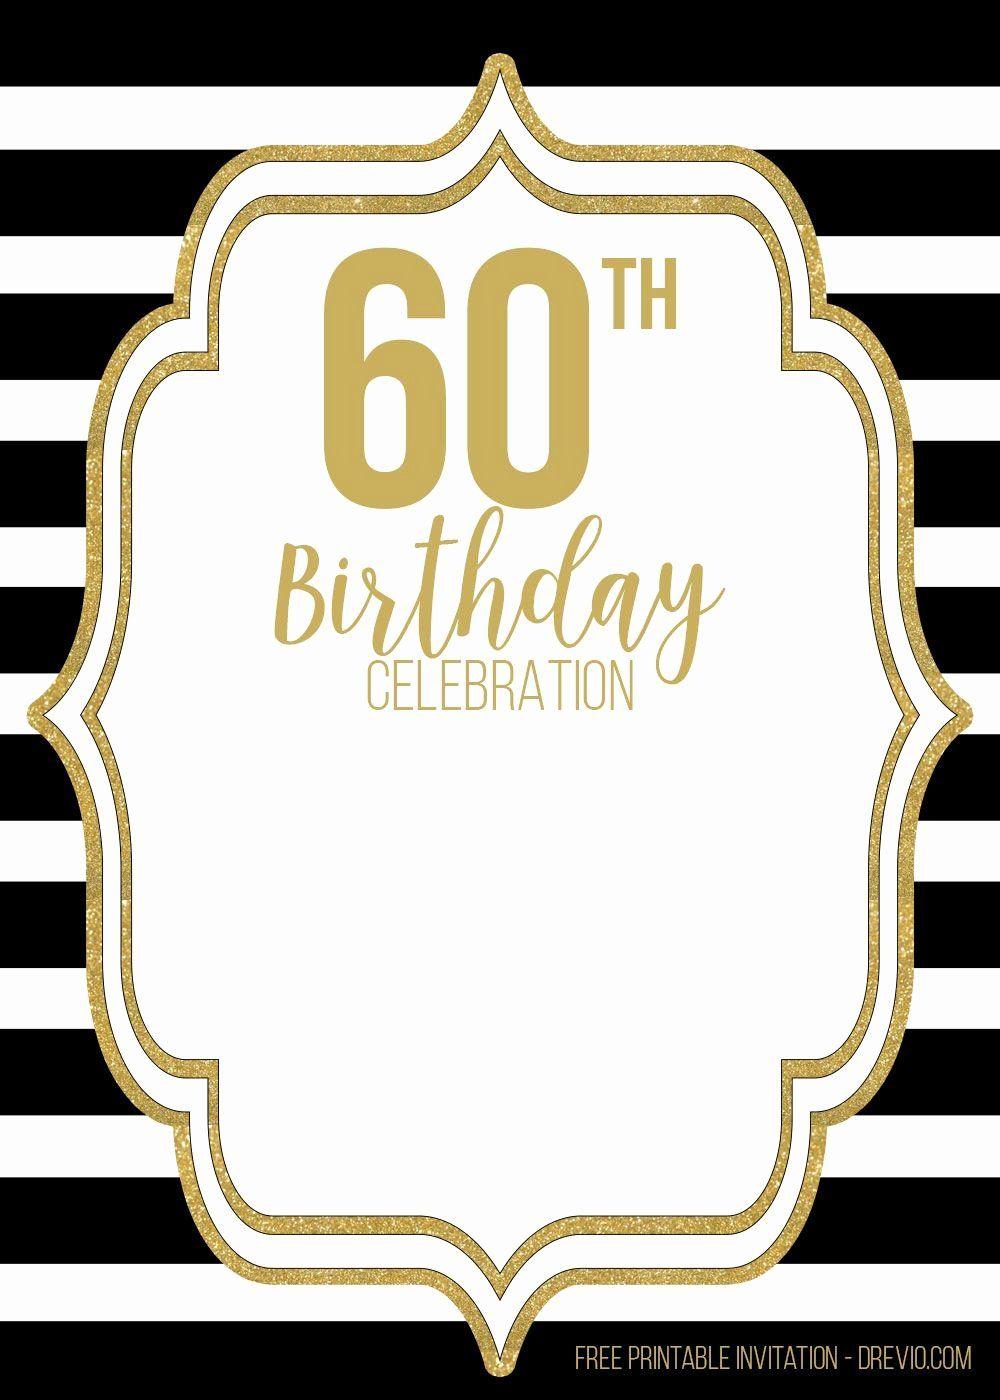 3 3th Birthday Invitation Template  Evite.best  Party invite